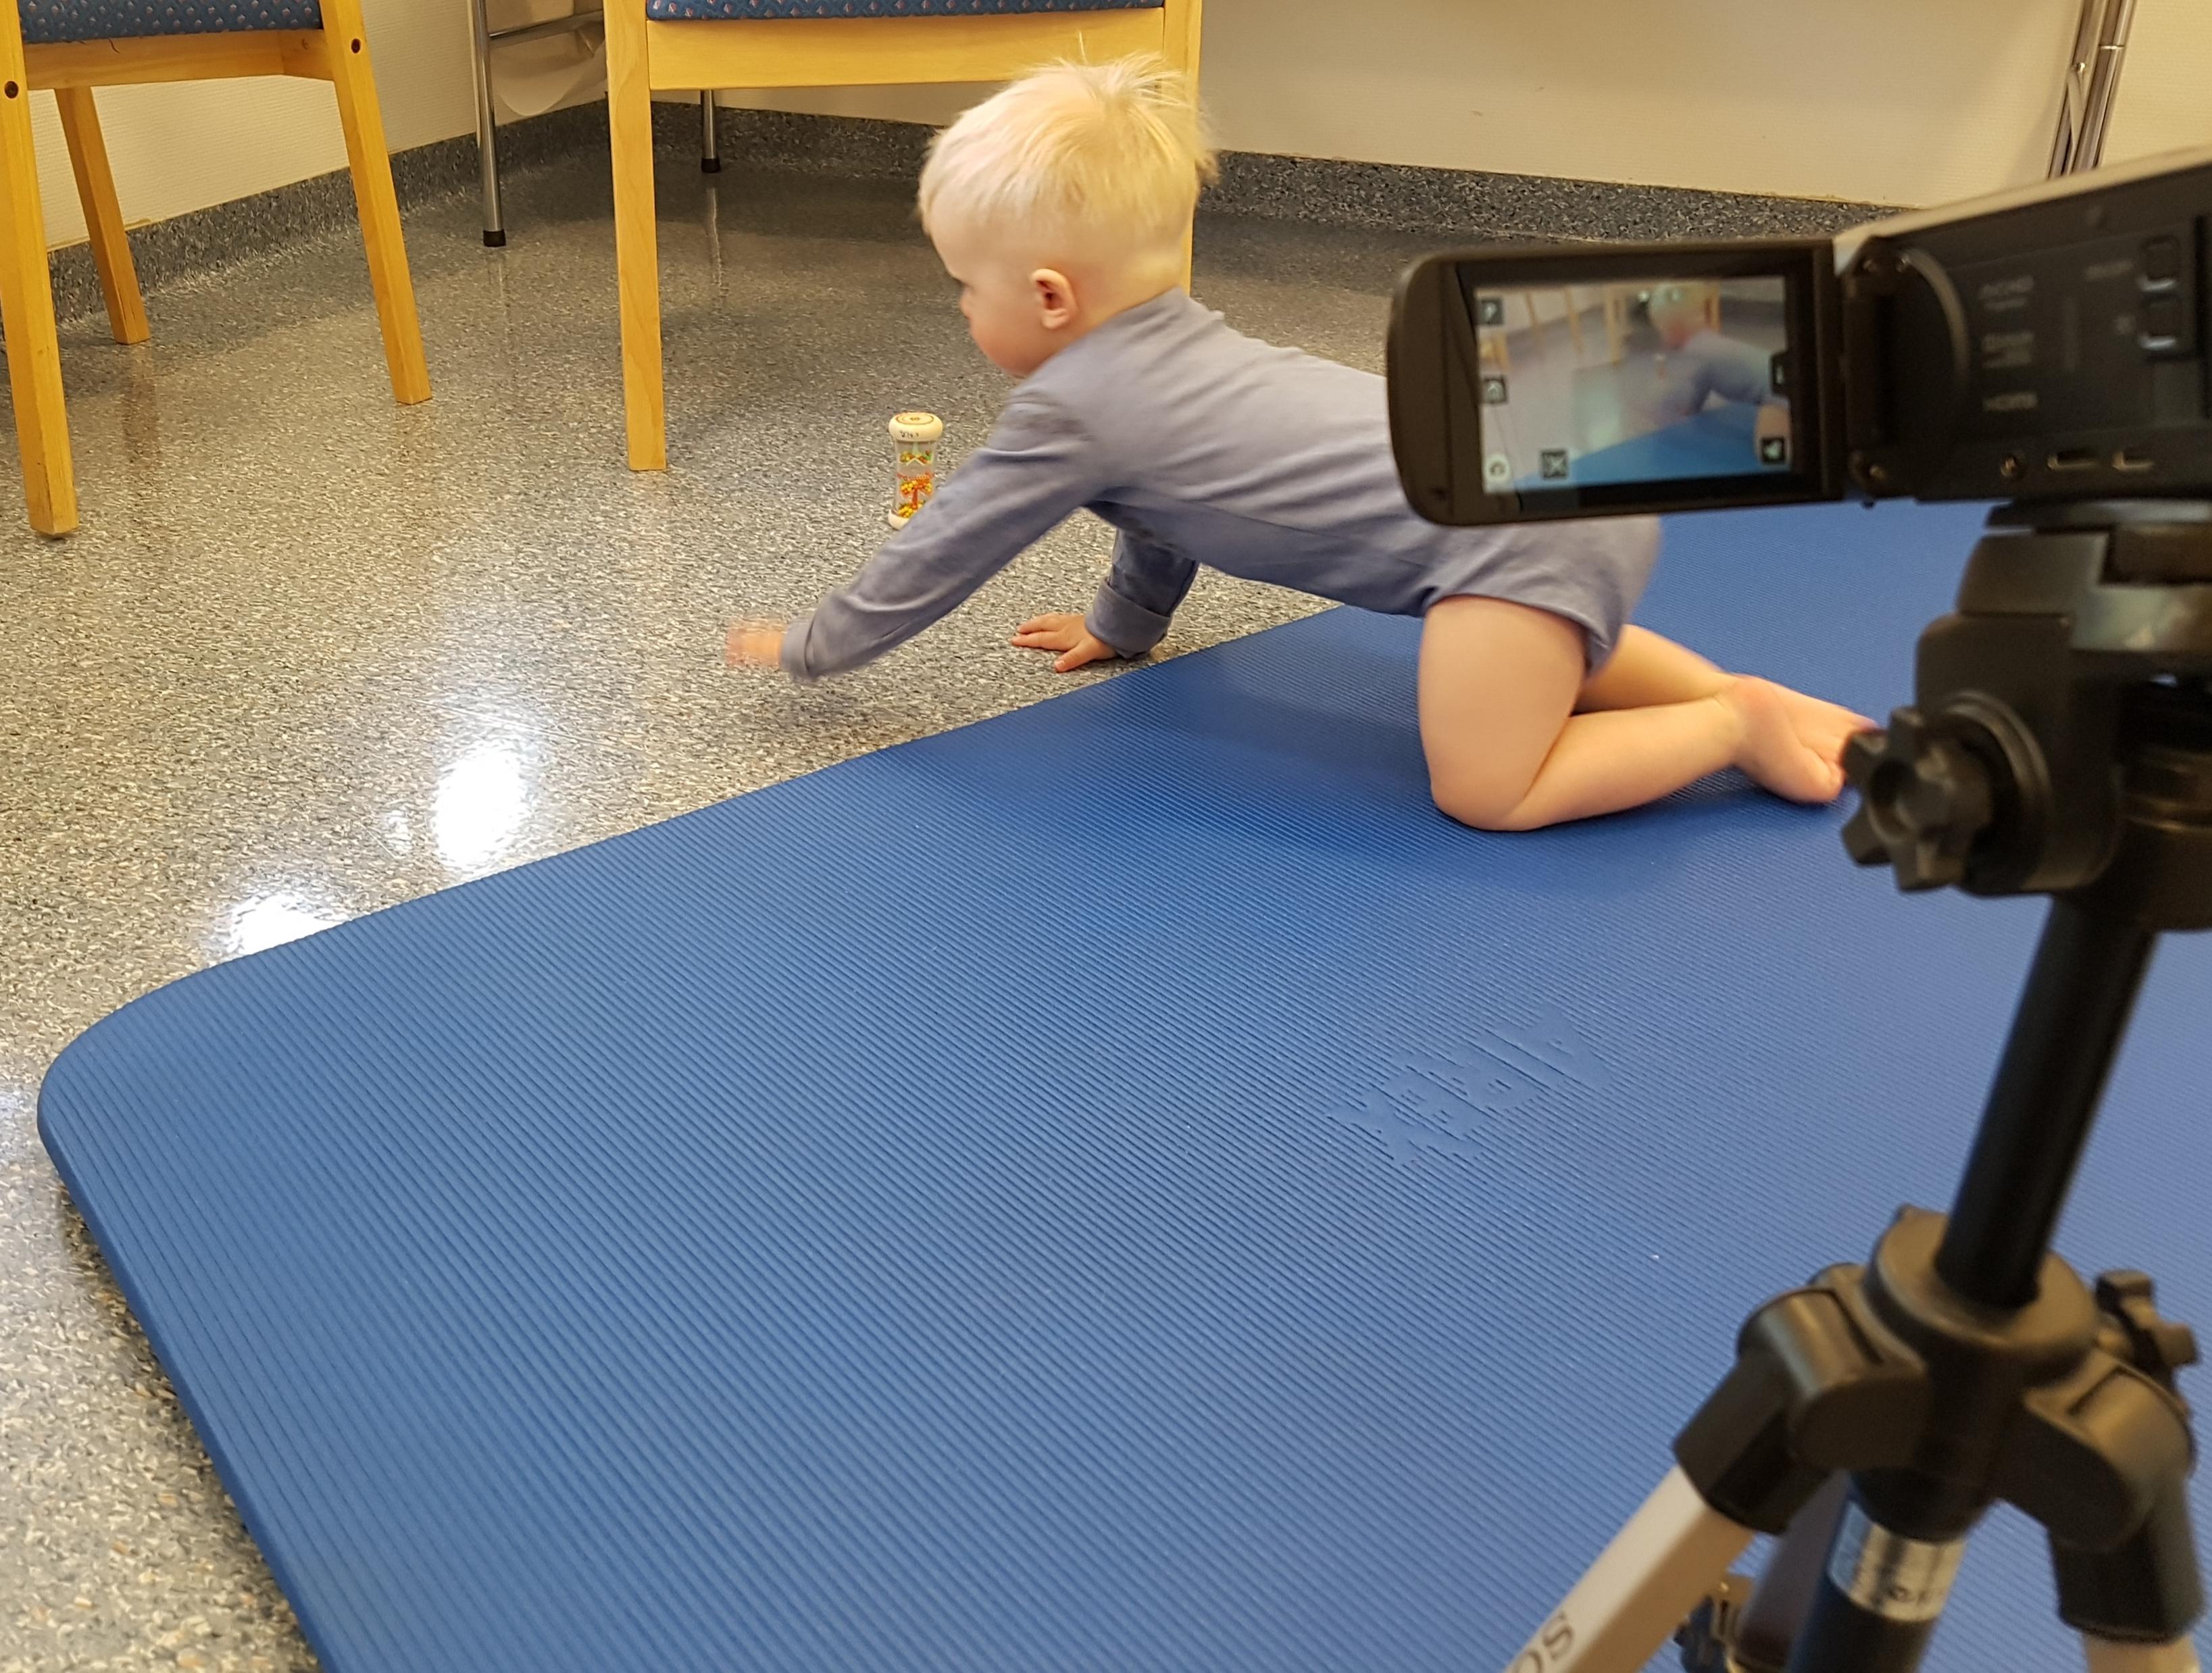 Video i journal - pasient liten.jpg